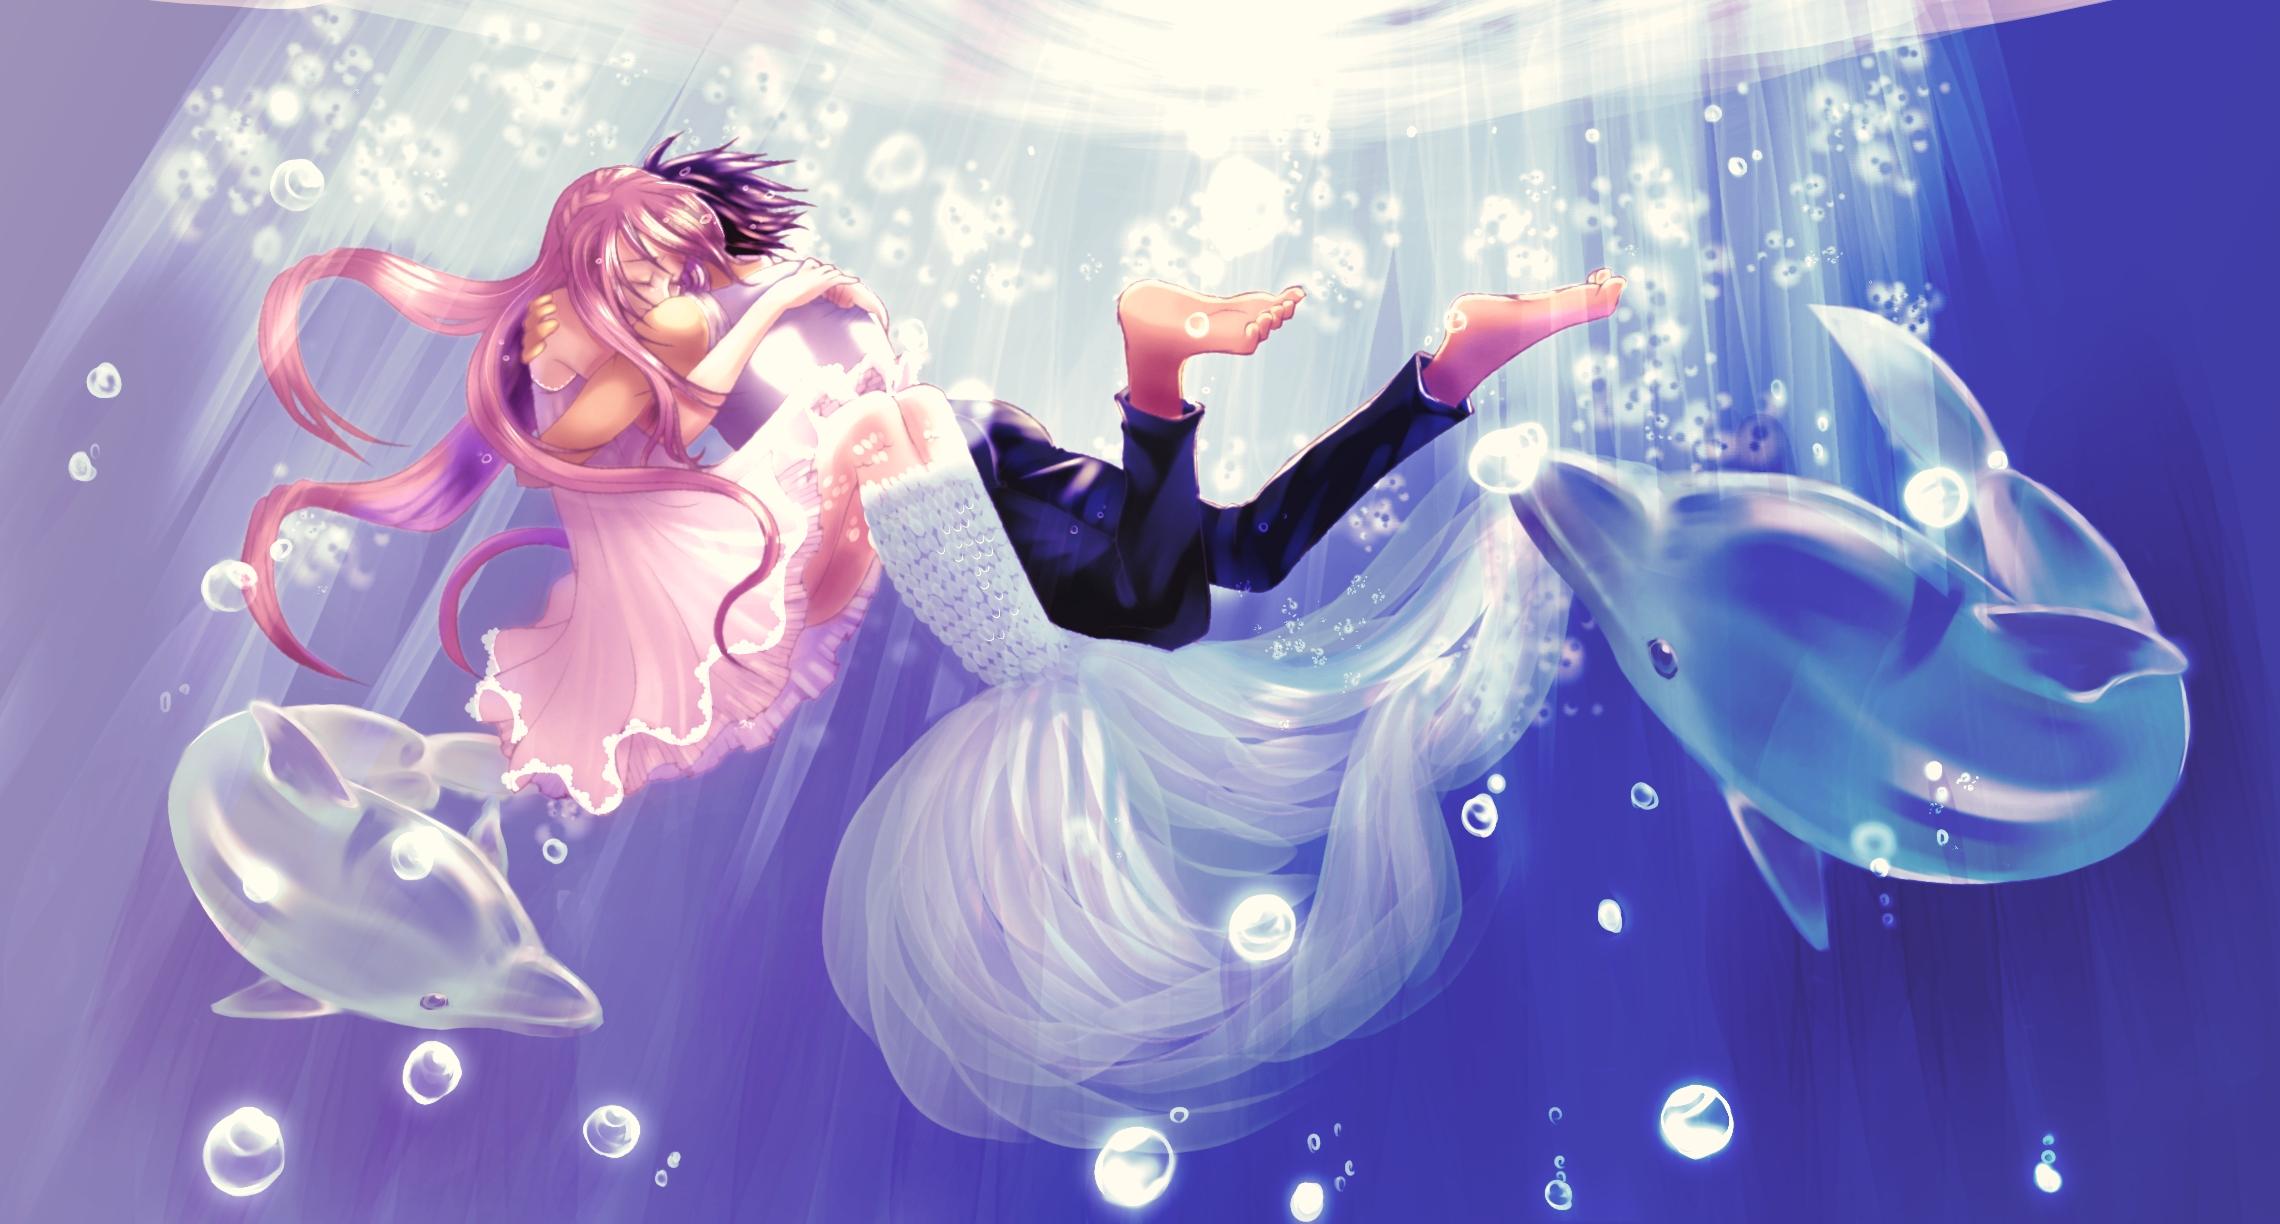 Anime Girl Mermaid And Boy - 8x8 Wallpaper - teahub.io